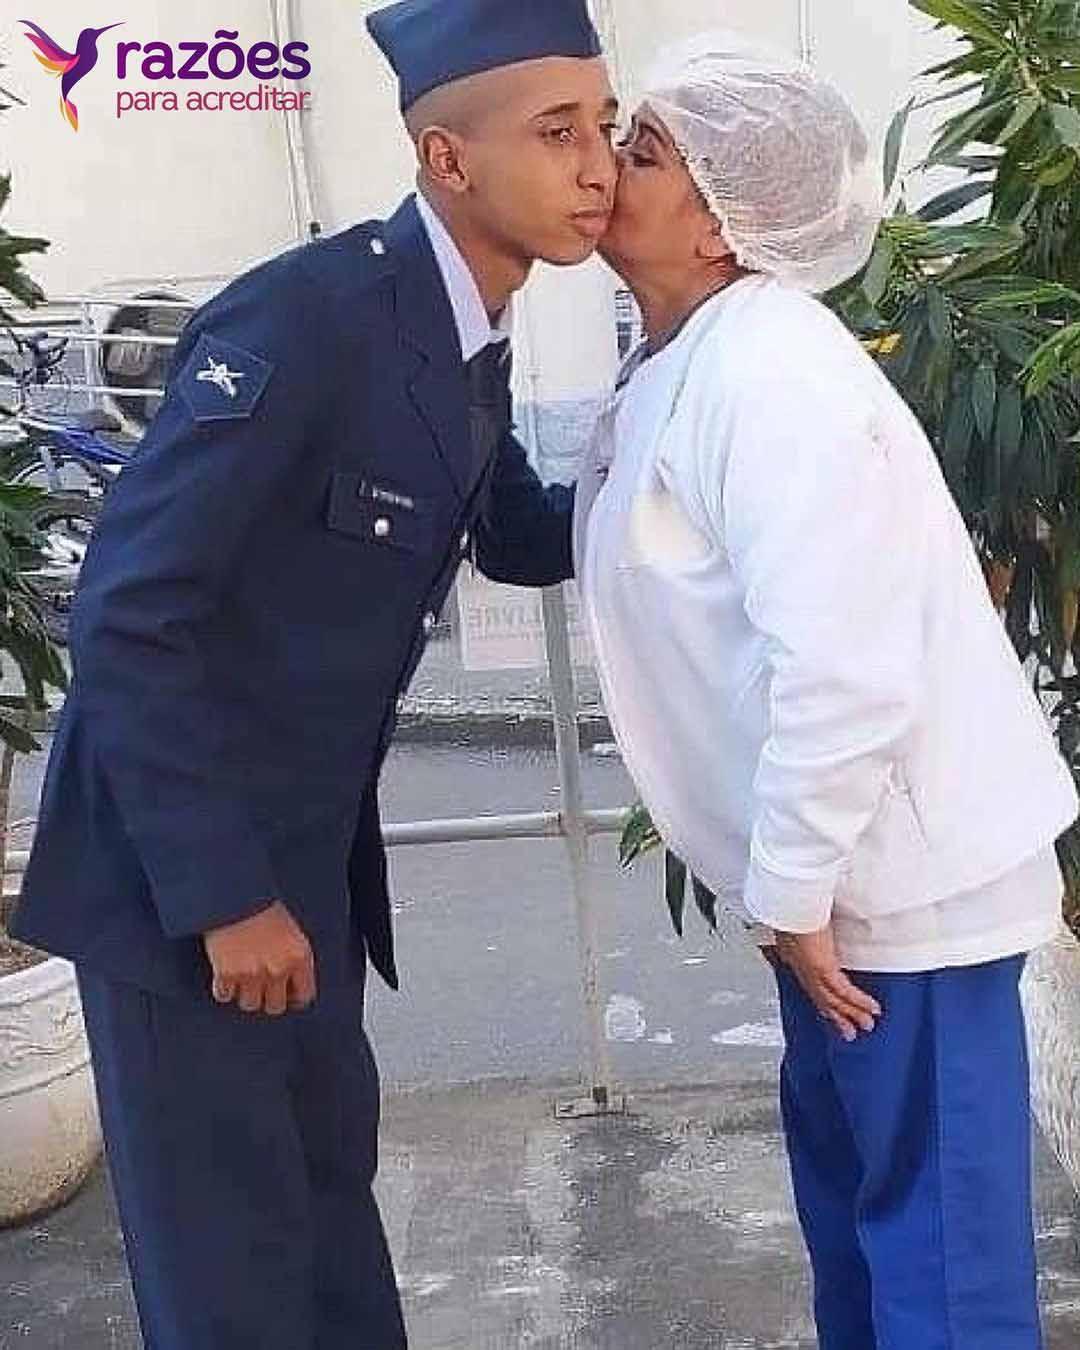 mãe beija filho após formatura